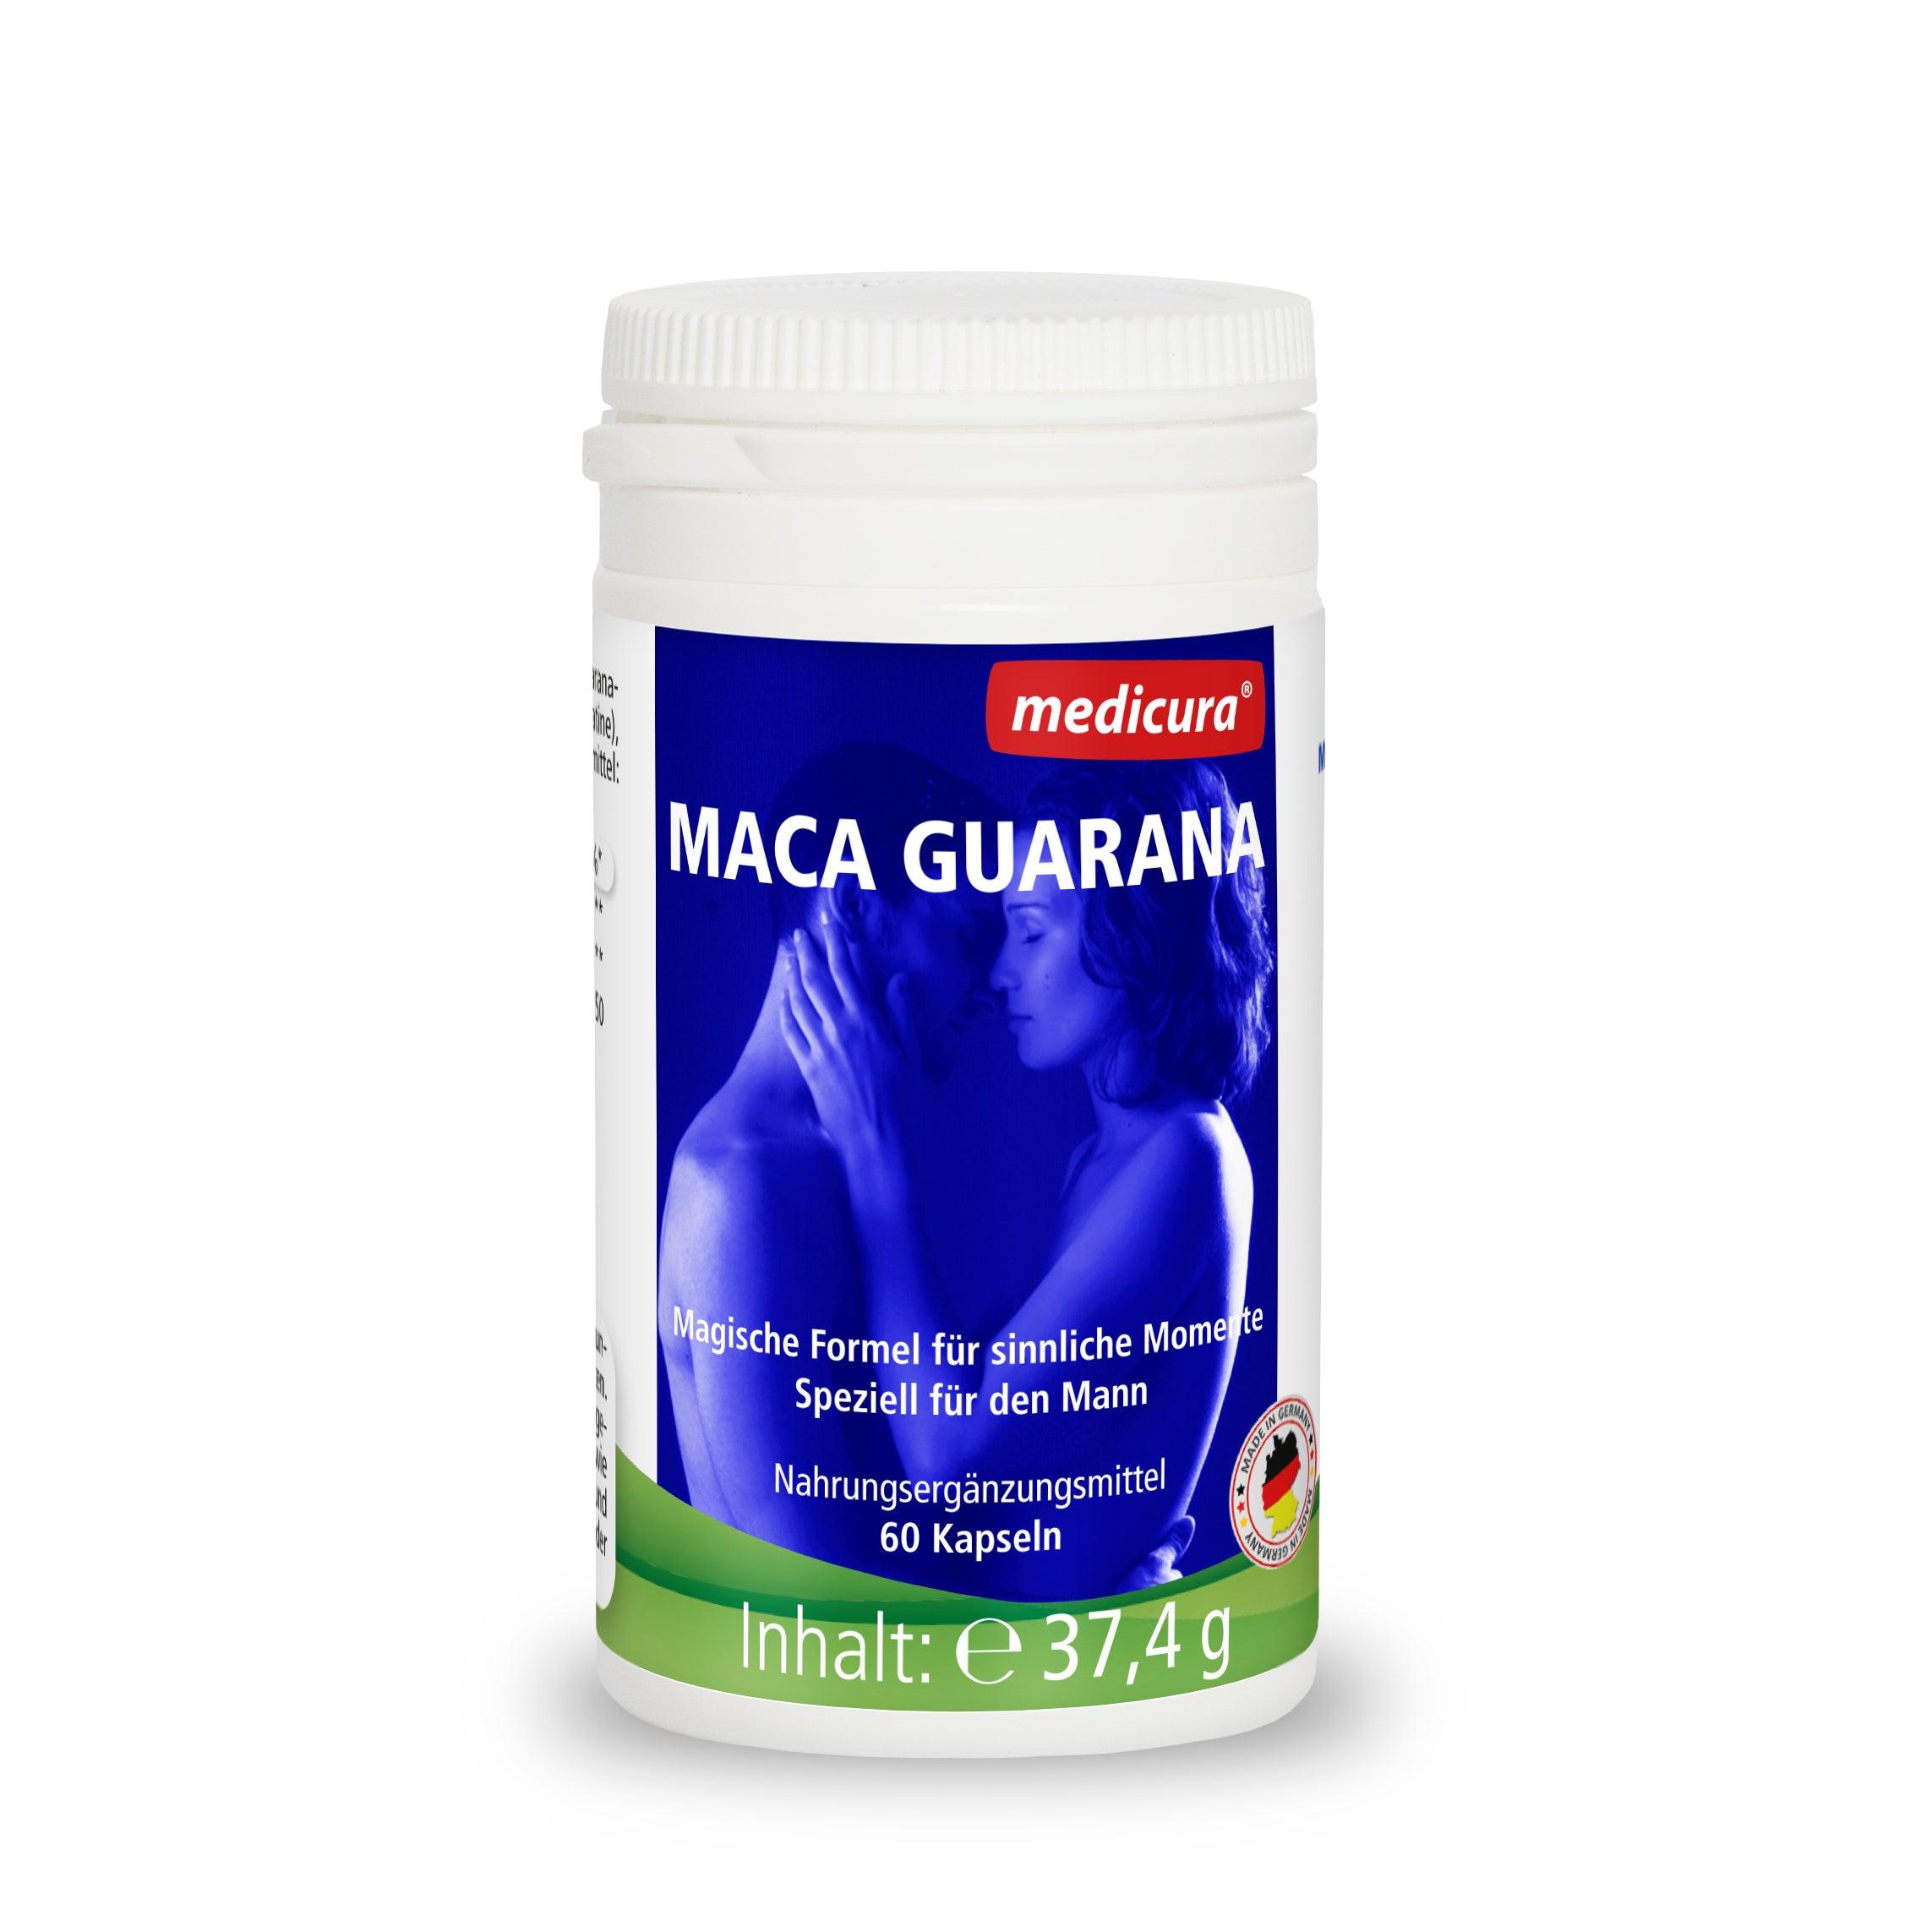 Maca Guarana - 60 Kapseln